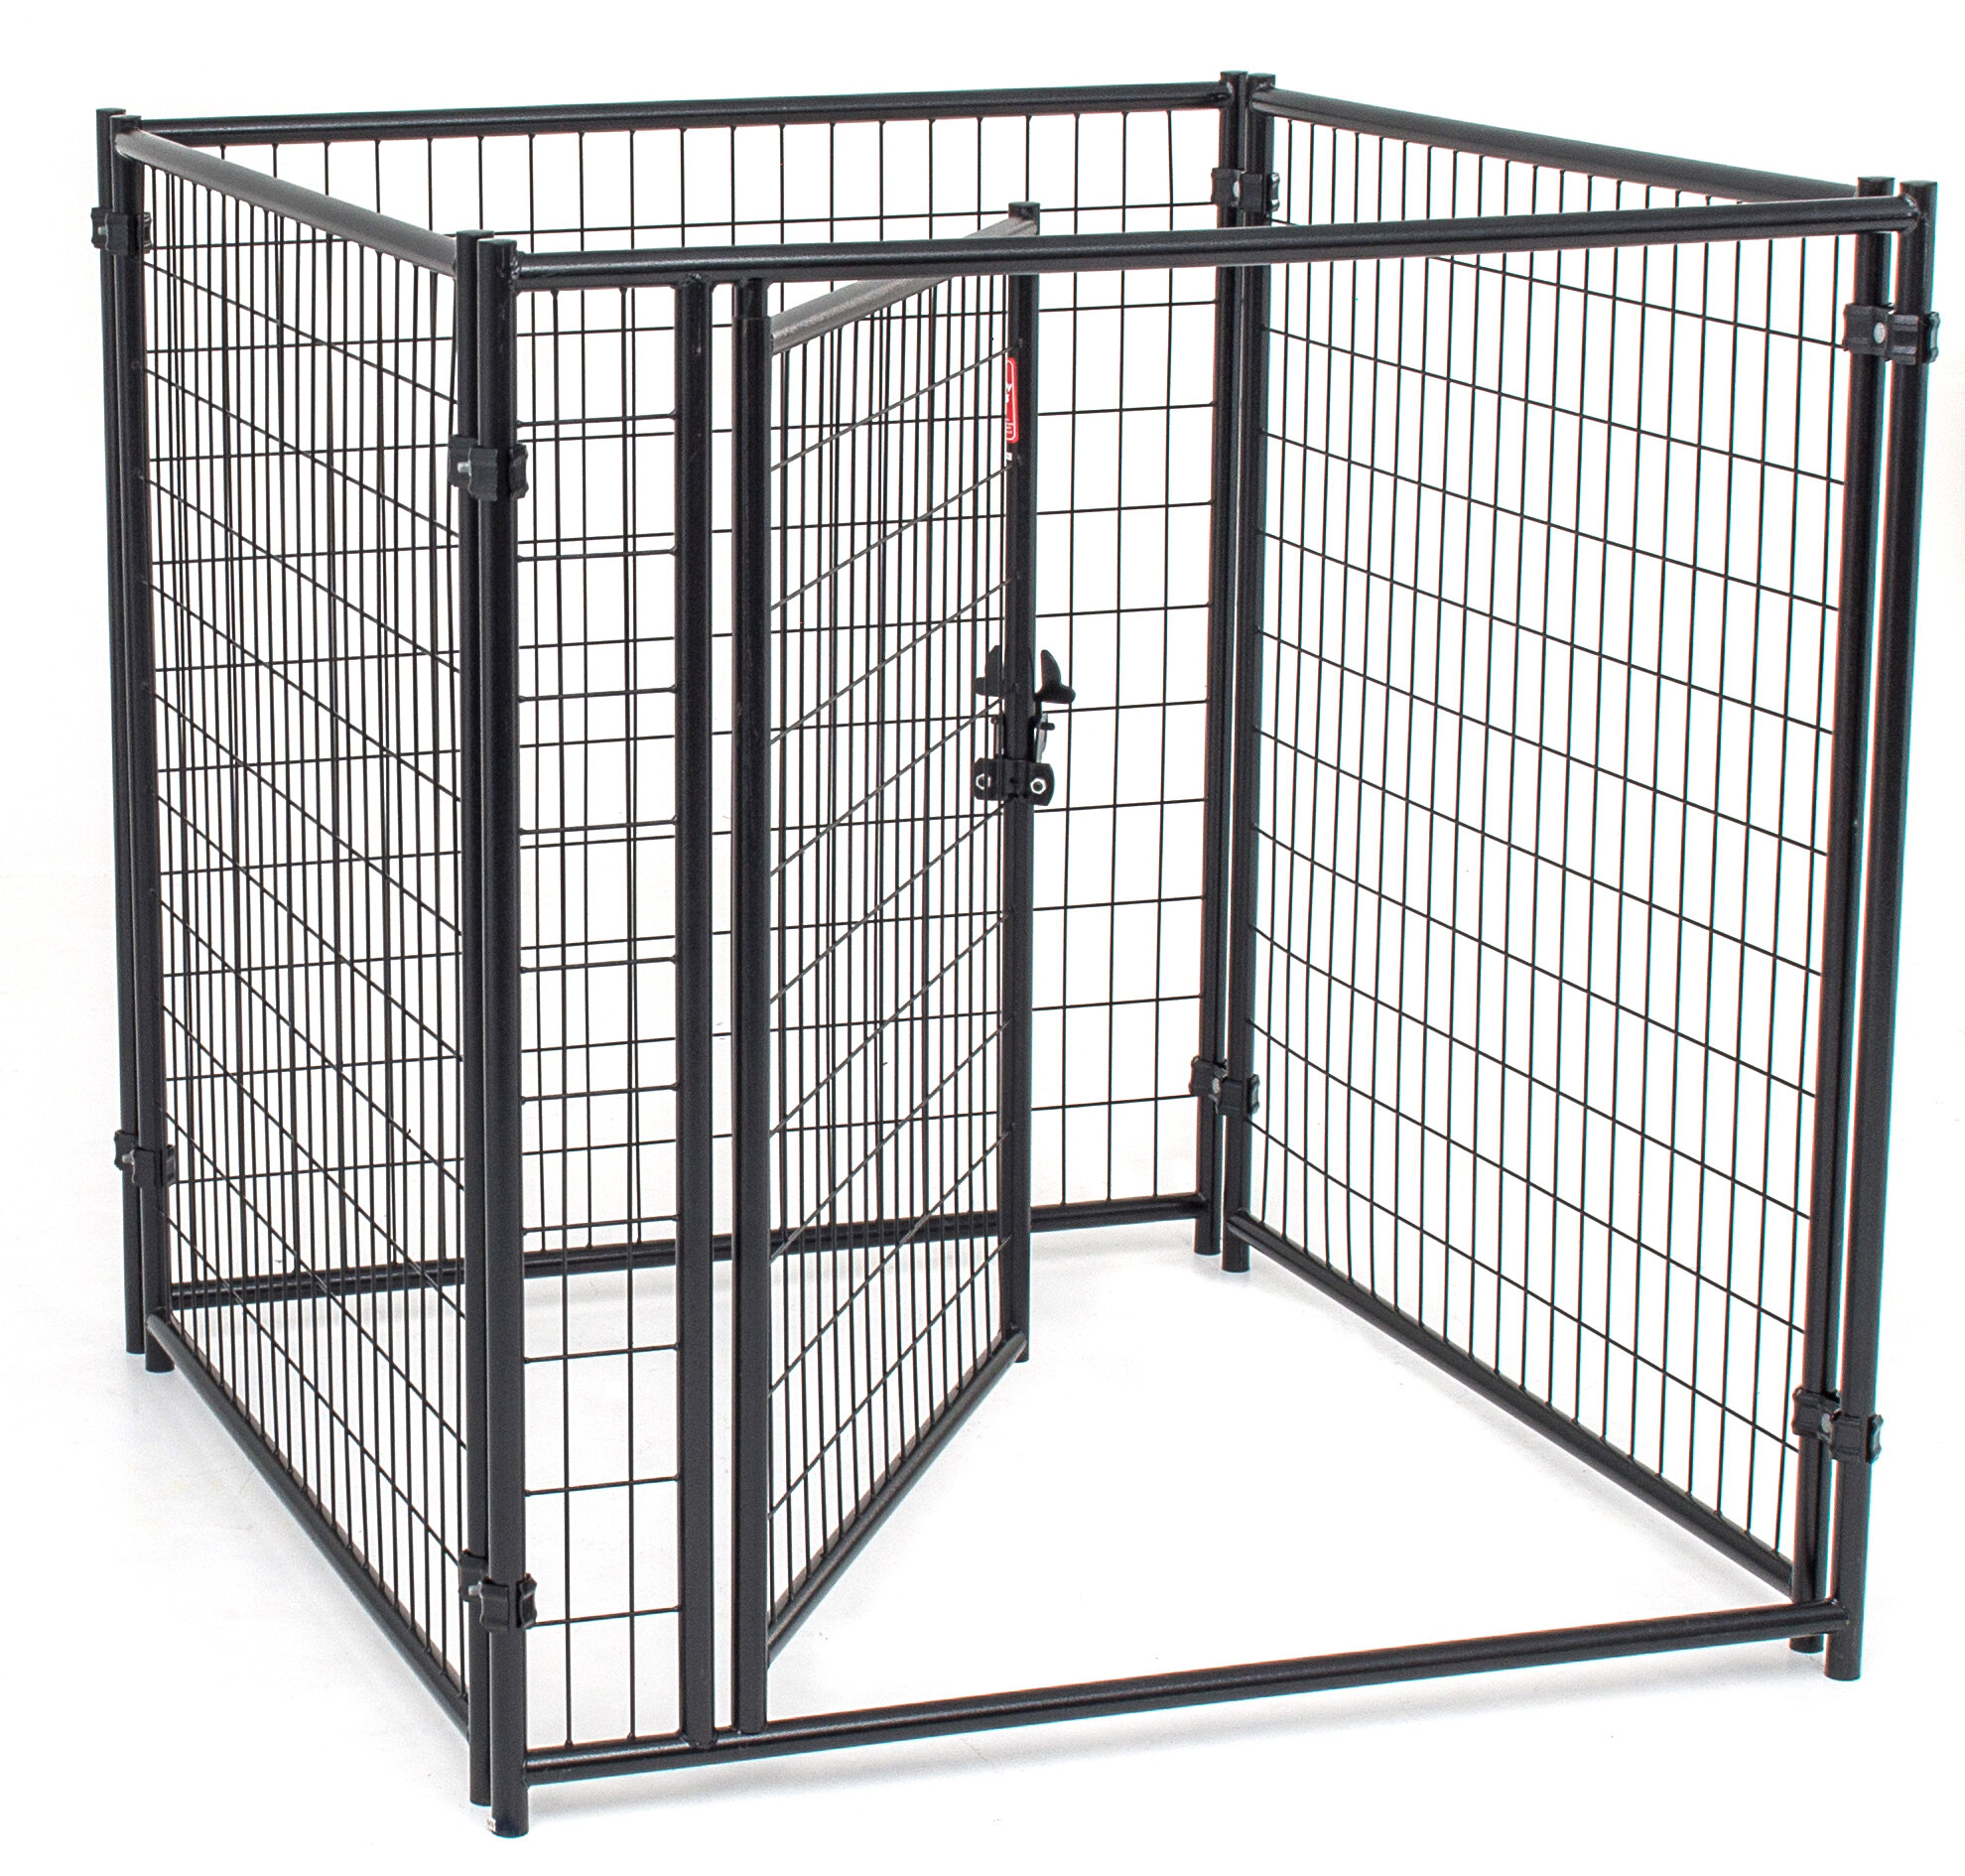 Jewett Cameron Lucky Dog™ Modular Welded Wire Kennel Kit | Wayfair